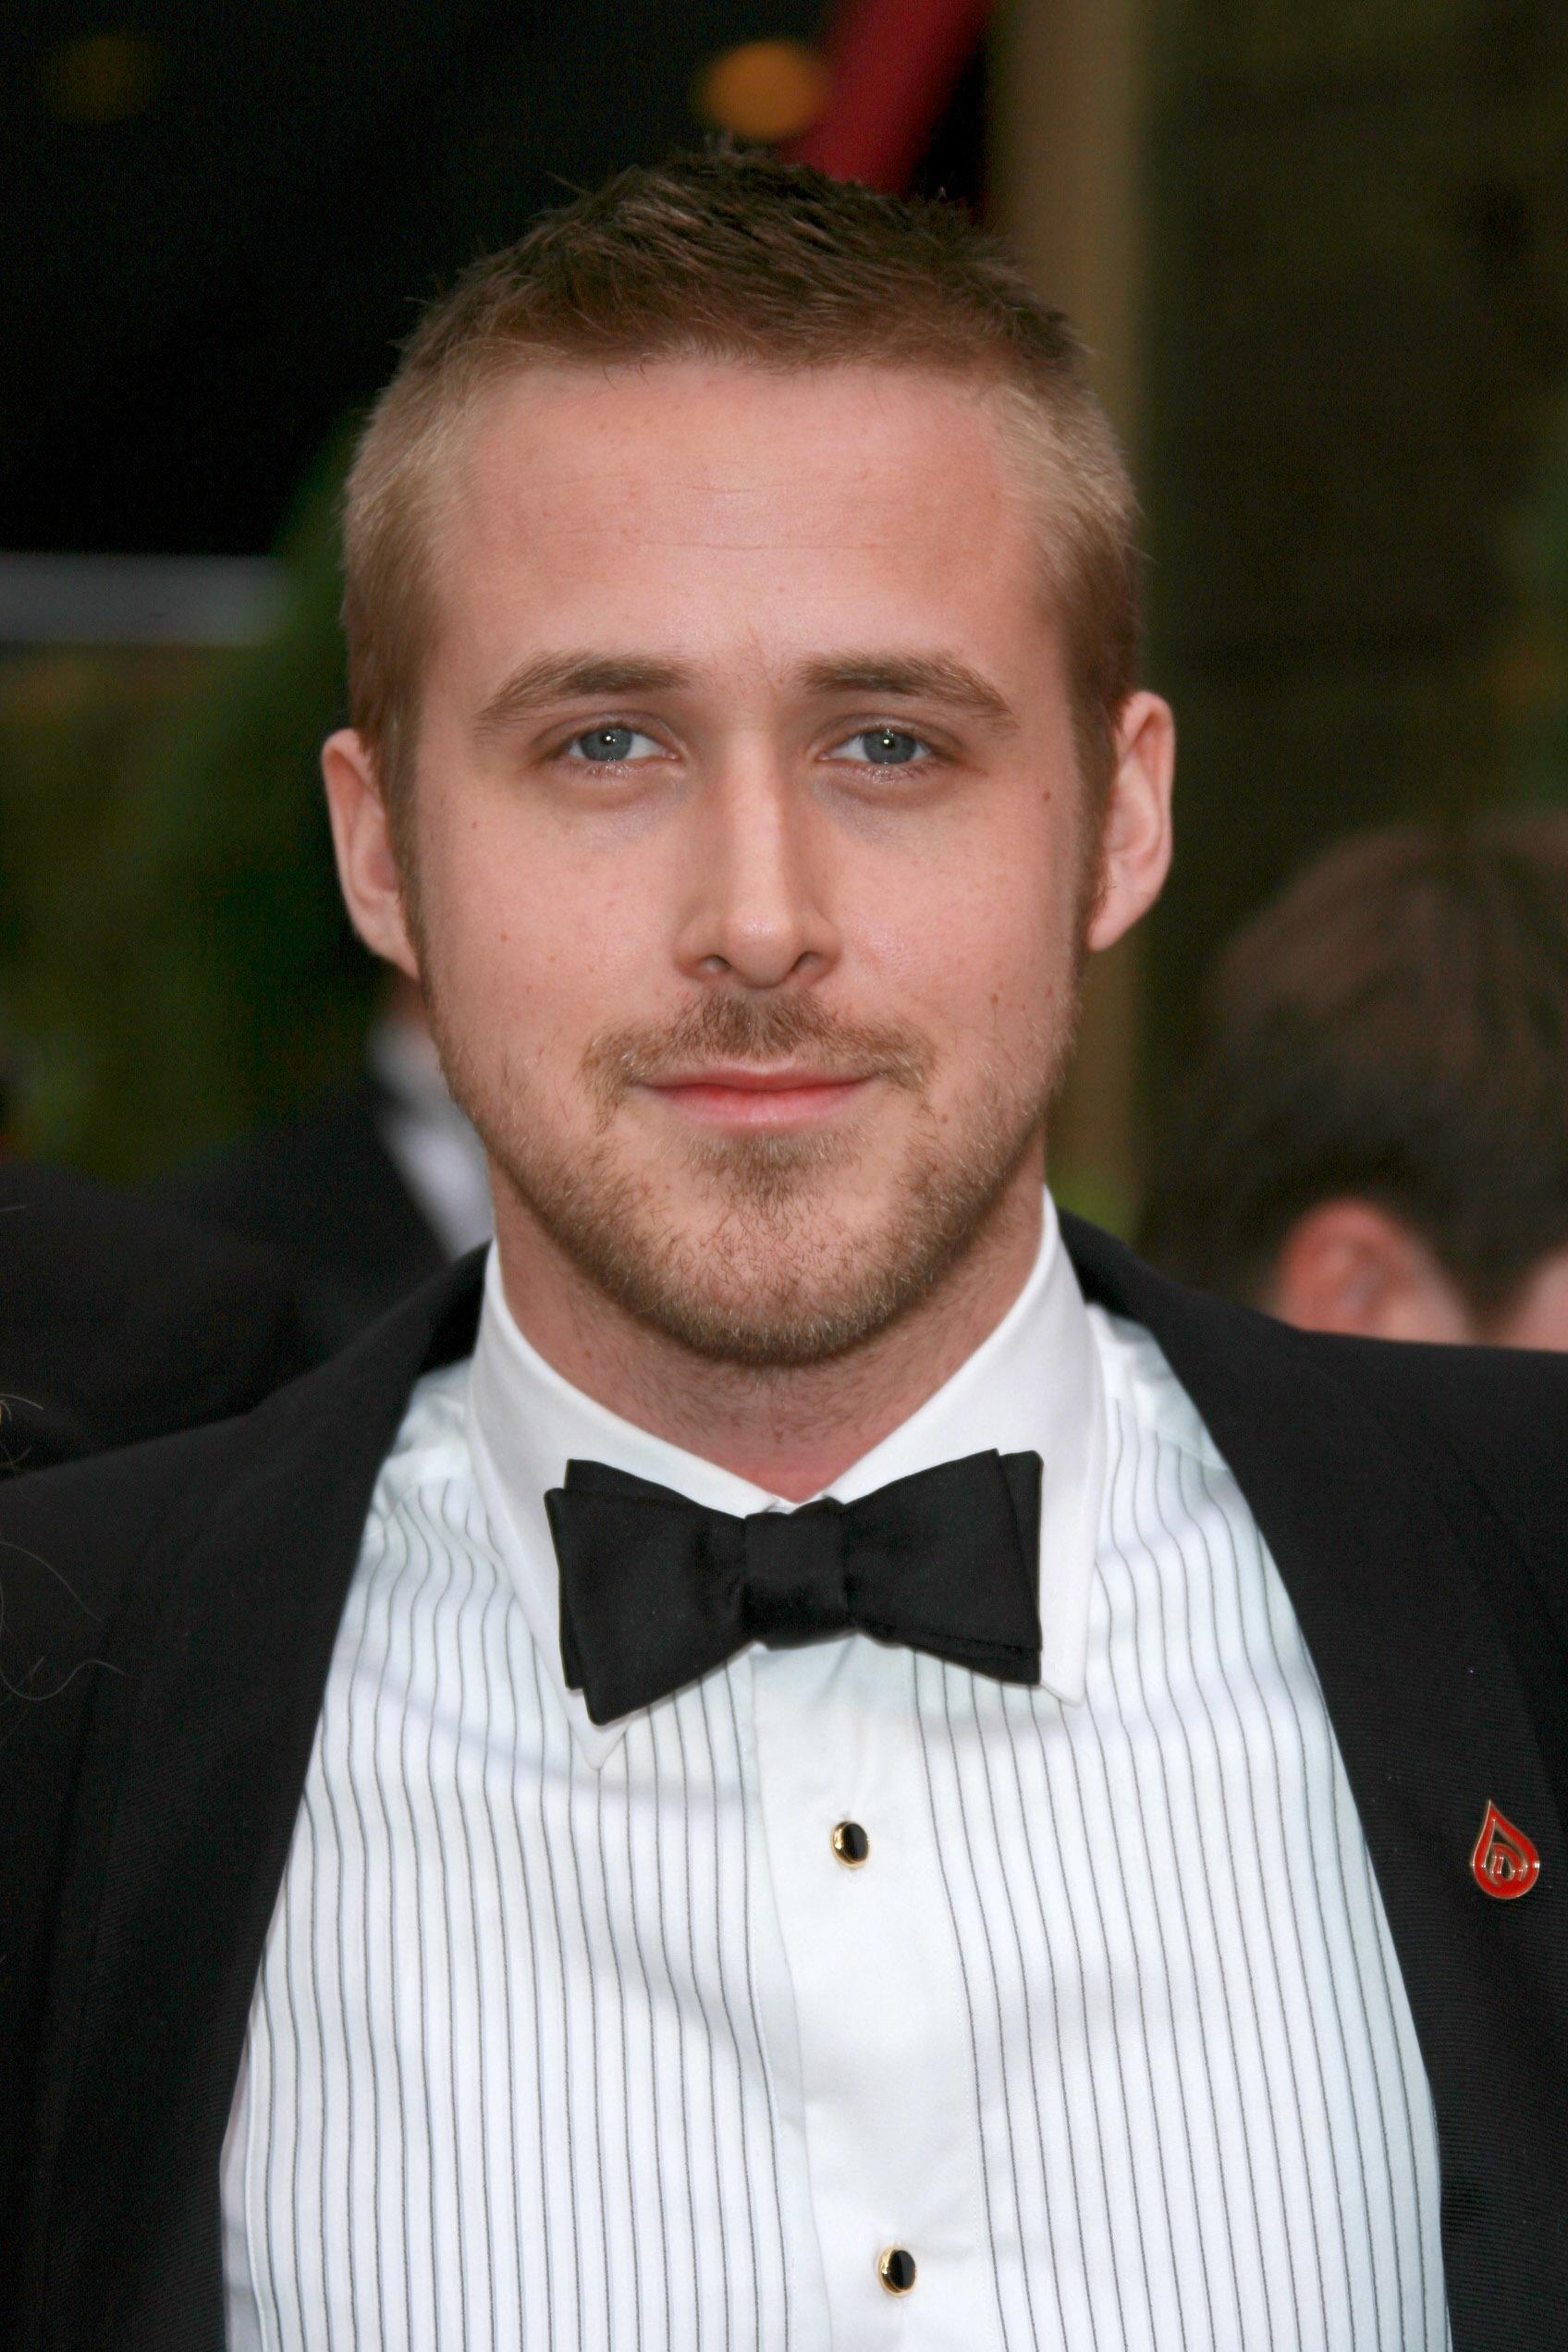 Ryan Gosling haircut: Ryan Gosling with a short dark blonde buzz cut